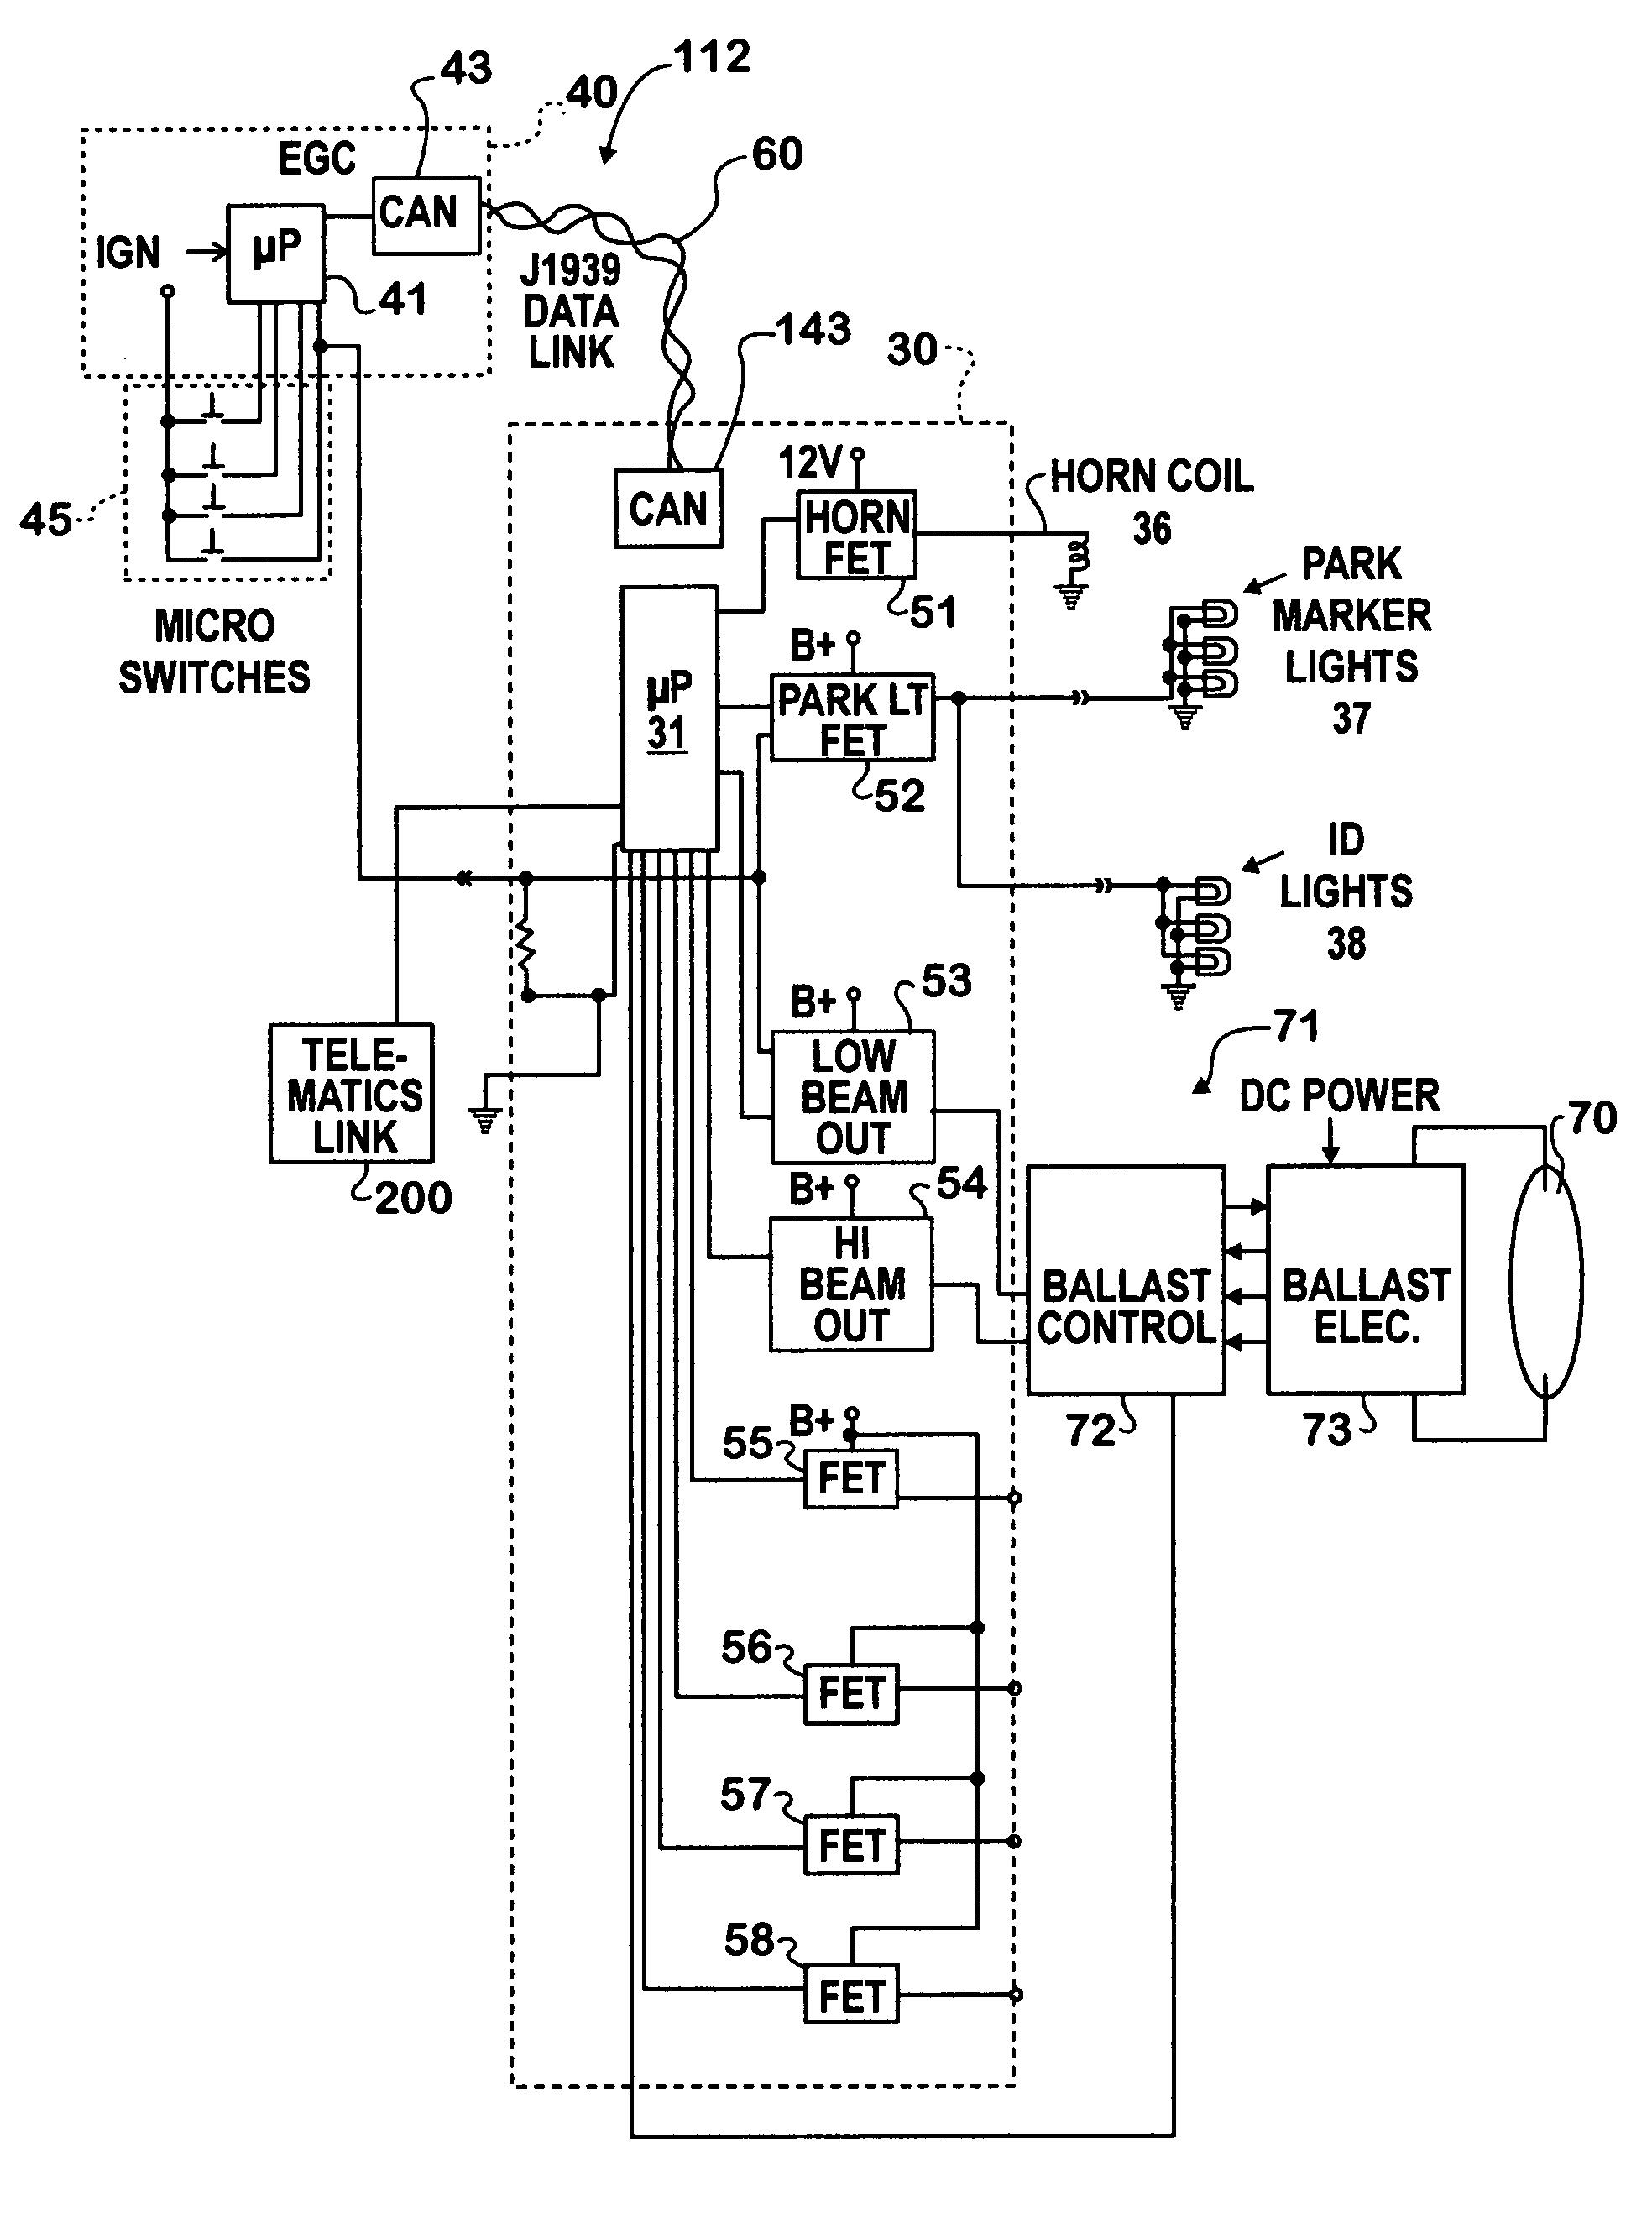 wiring diagram 2000 oldsmobile intrigue best wiring library Oldsmobile Aurora Wiring-Diagram 2000 oldsmobile intrigue headlight wiring diagram sh3 me oldsmobile wiring diagrams olds alero wiring diagrams